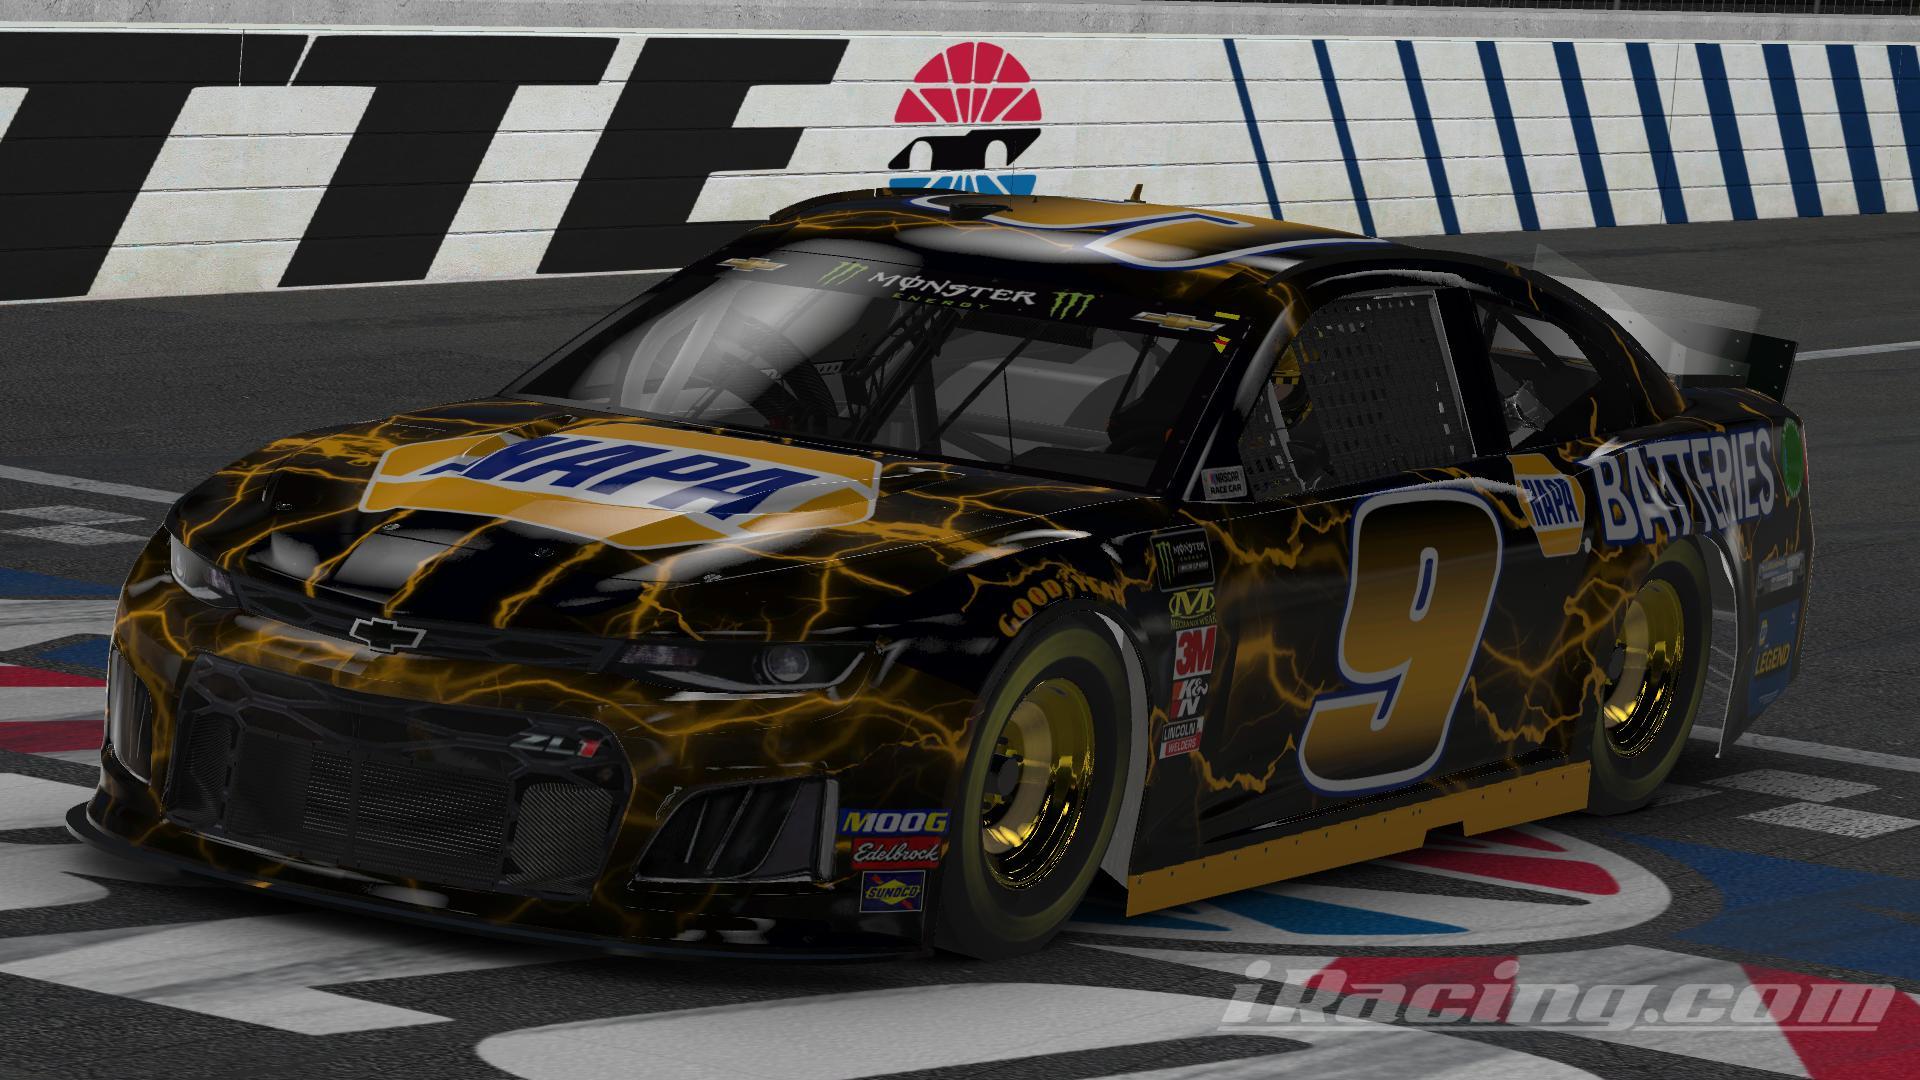 Preview of NAPA Chase Elliott Legend Battery Black Car (No #) by Chris T J.